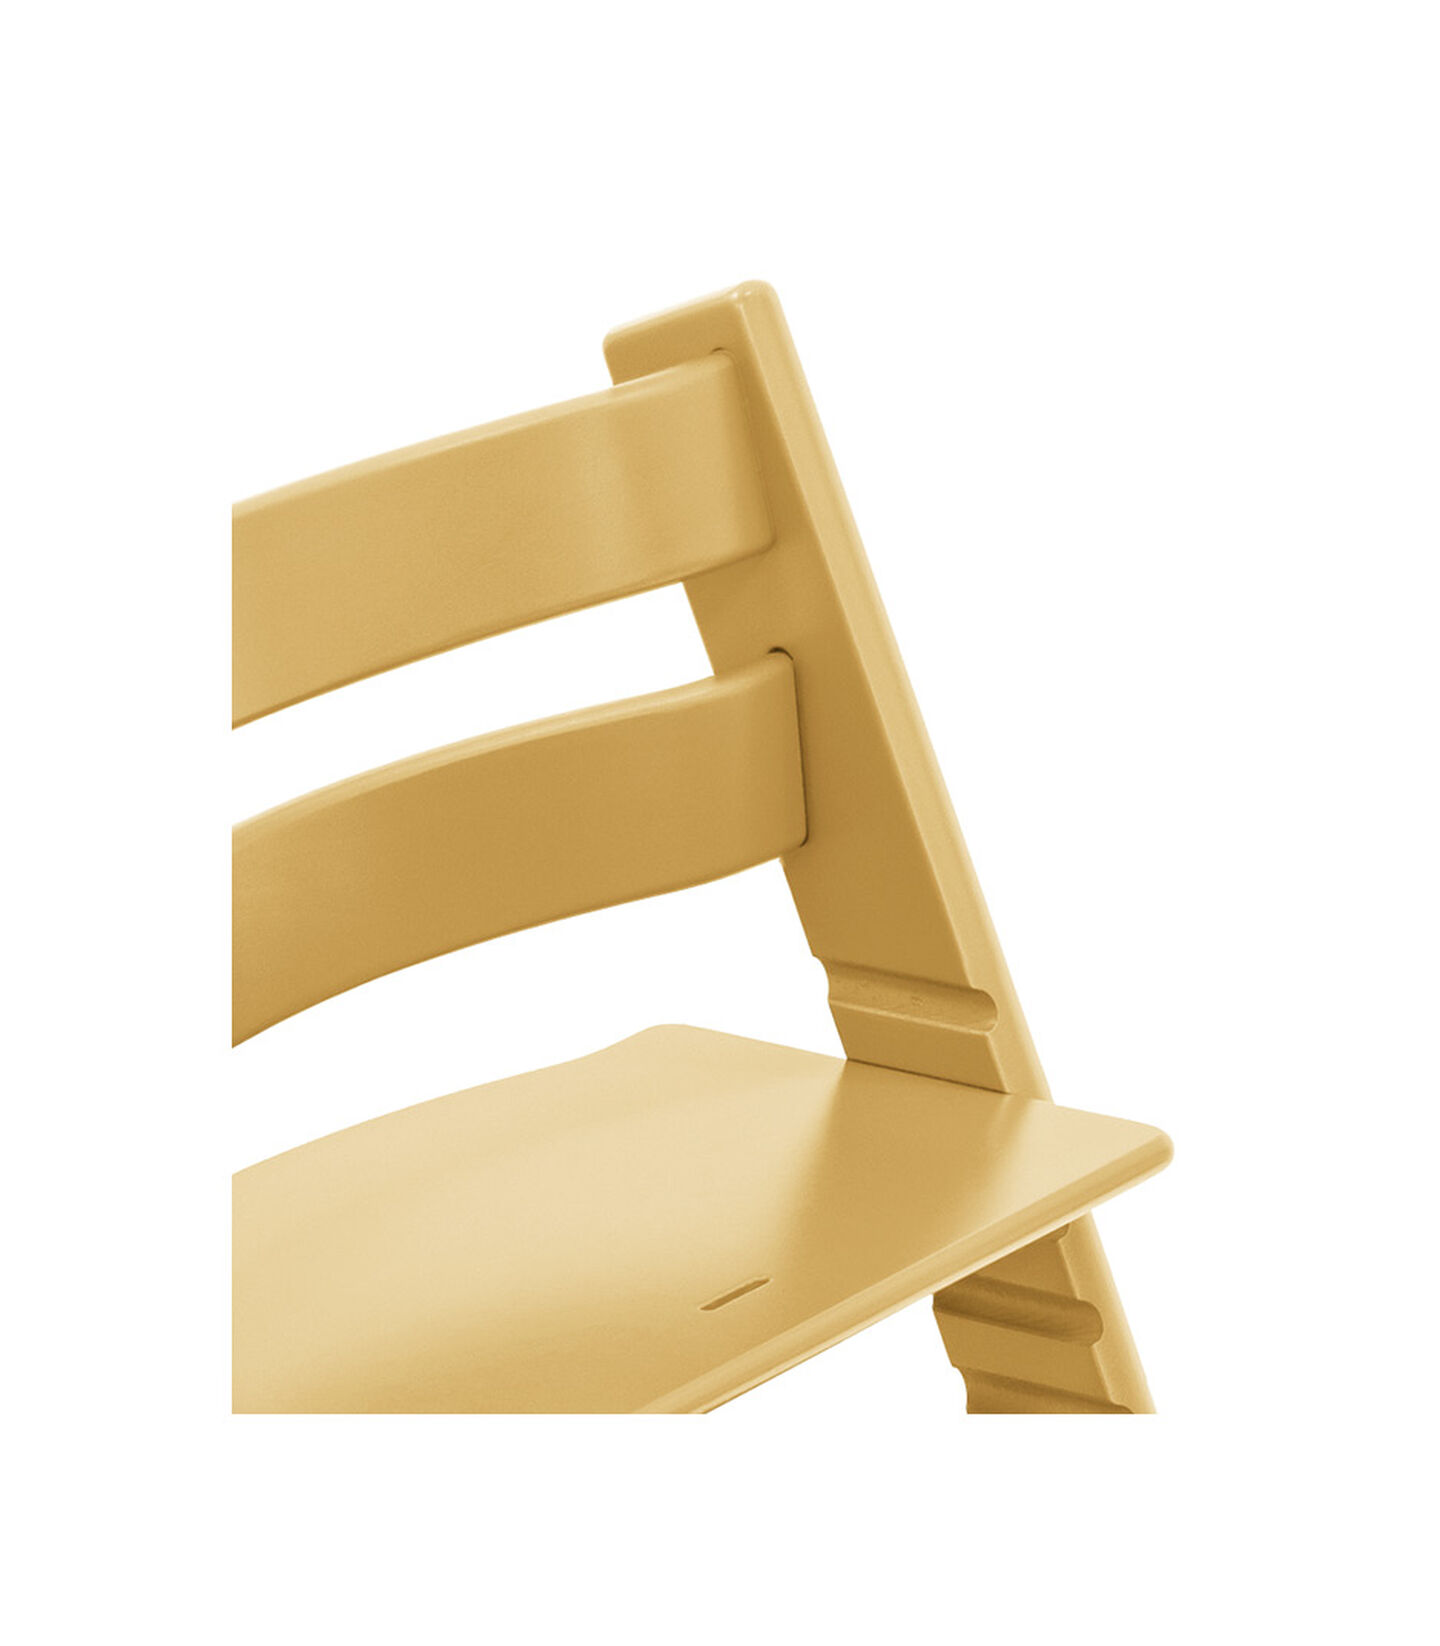 Tripp Trapp® Chair Sunflower Yellow, Sunflower Yellow, mainview view 3